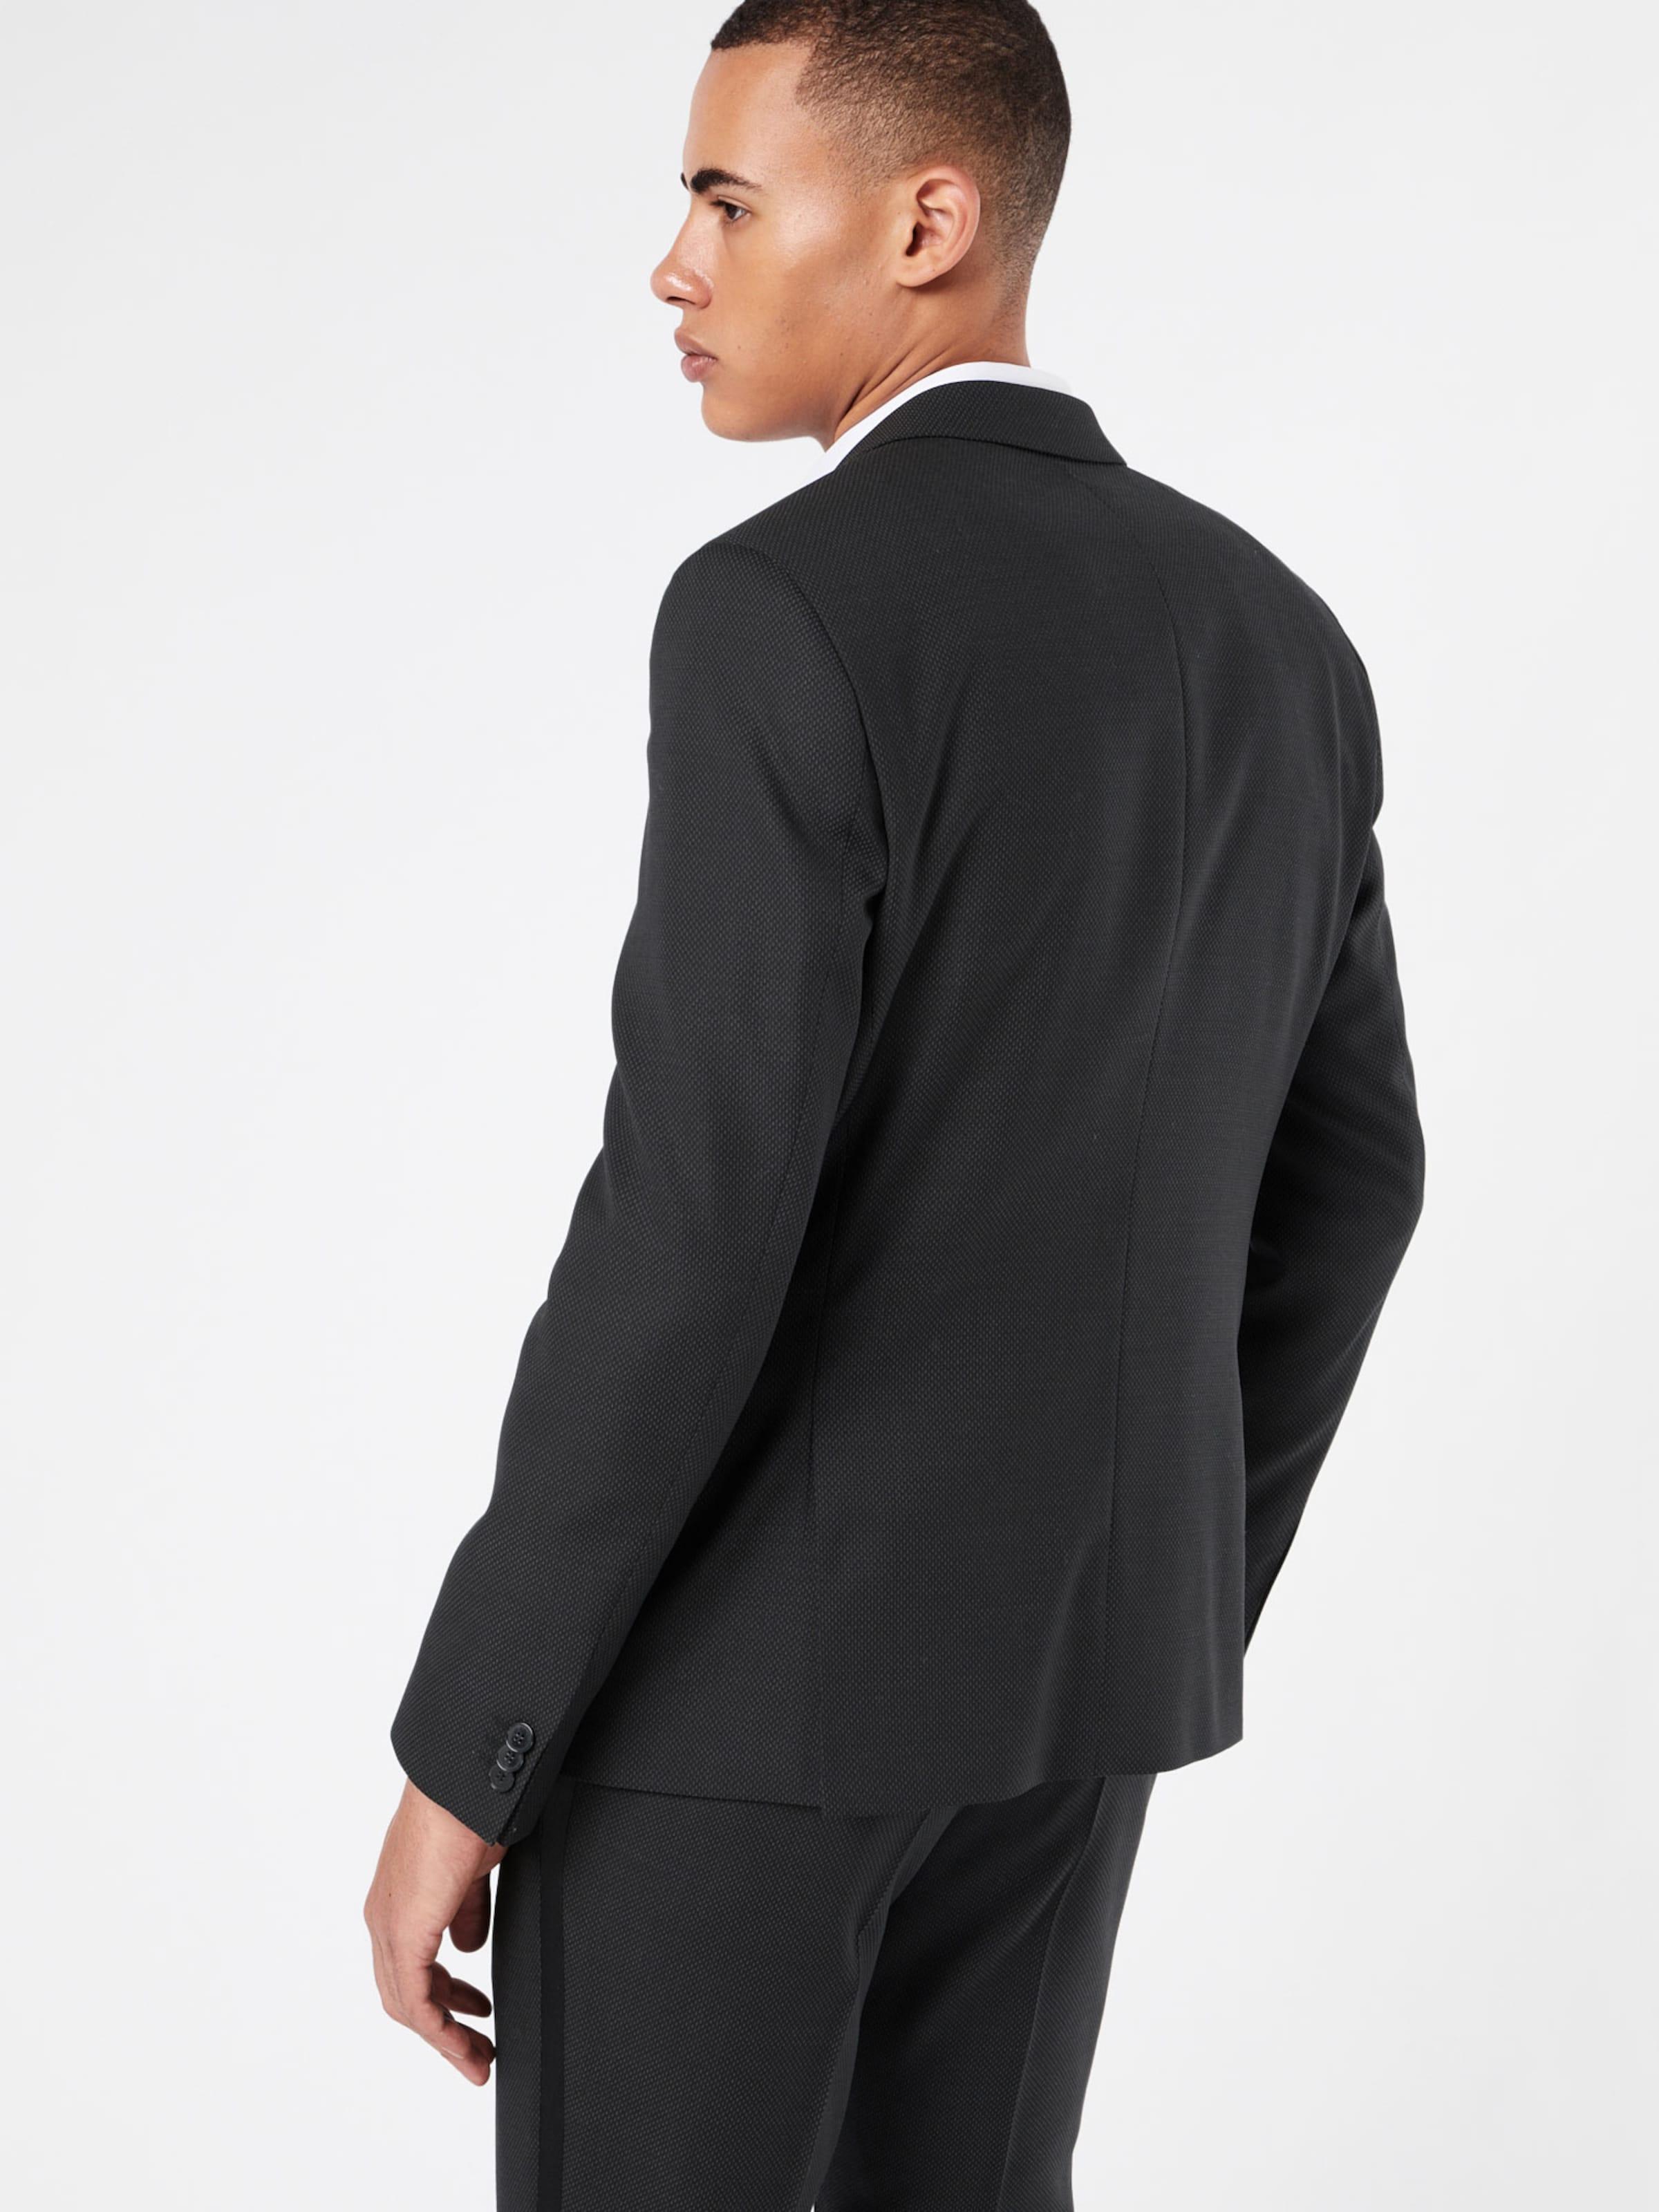 HUGO Slim Fit Anzug 'Alford/Hylor' Billig Footlocker Finish Fabrikpreis Neueste Nett pKAJeLLWWG